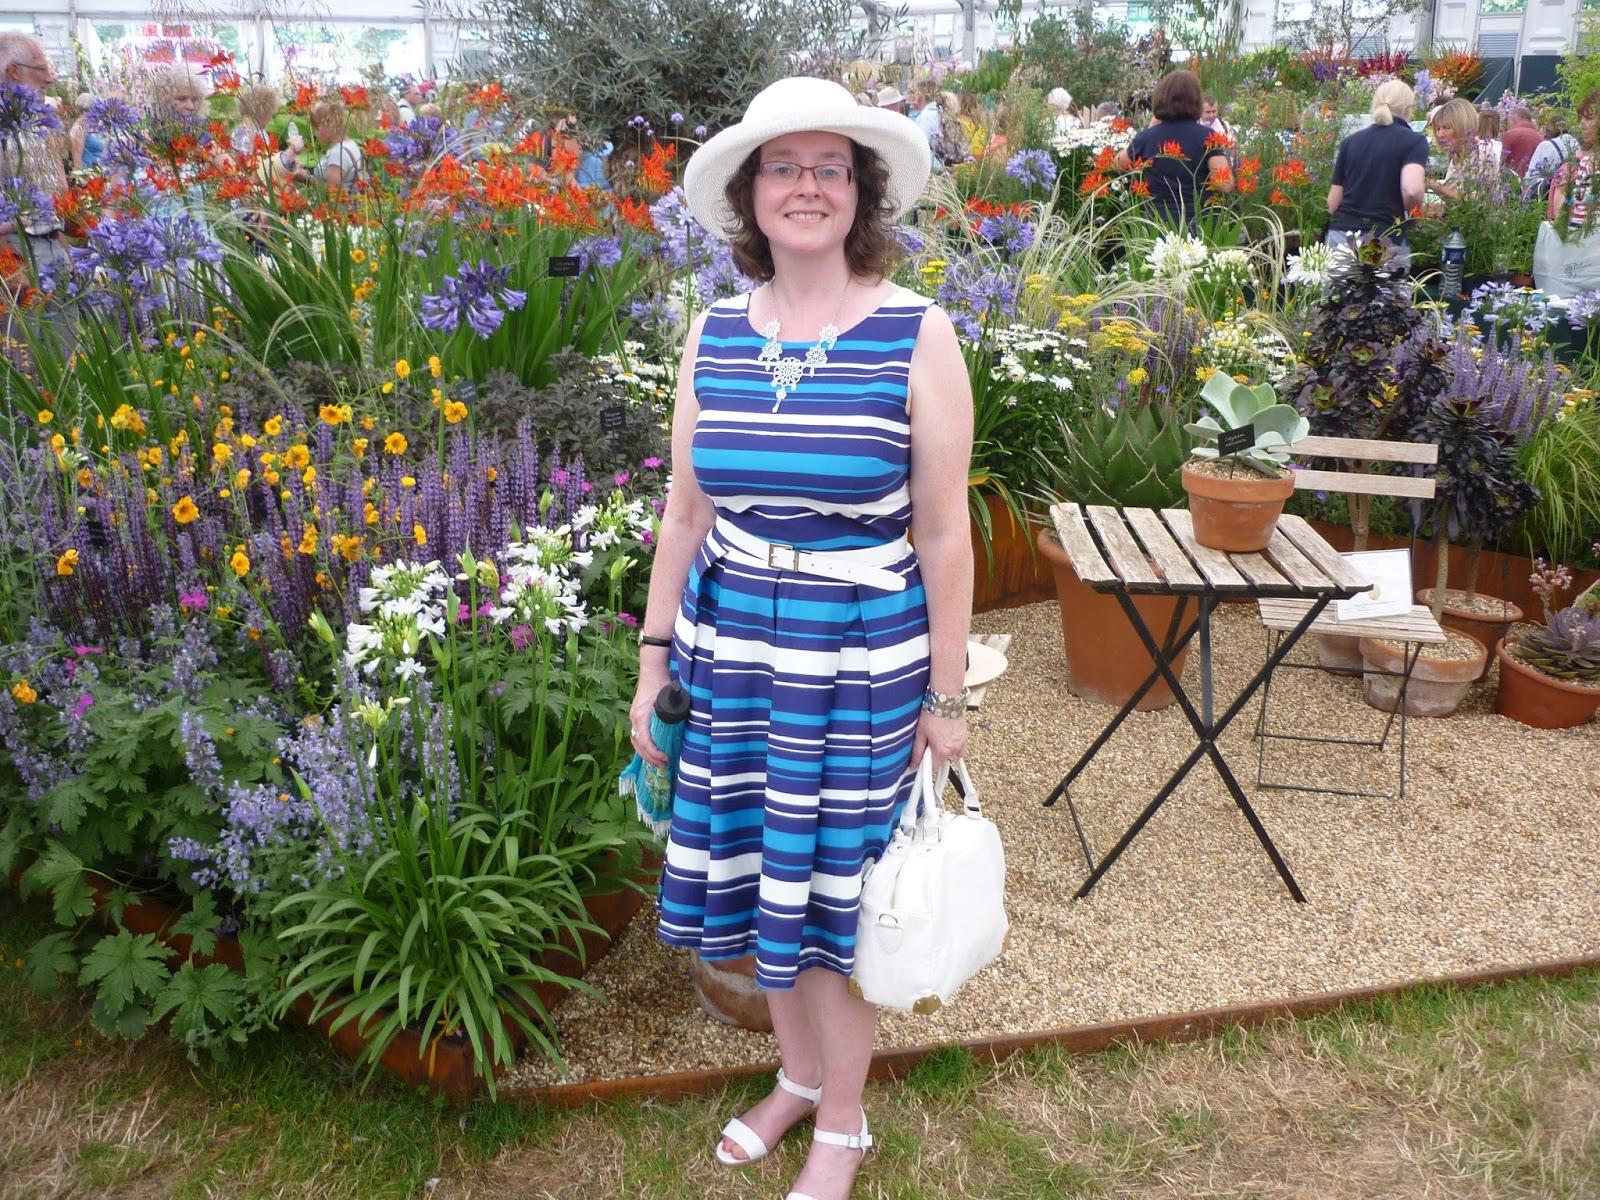 Blue and white striped dress; PetiteSilverVixen